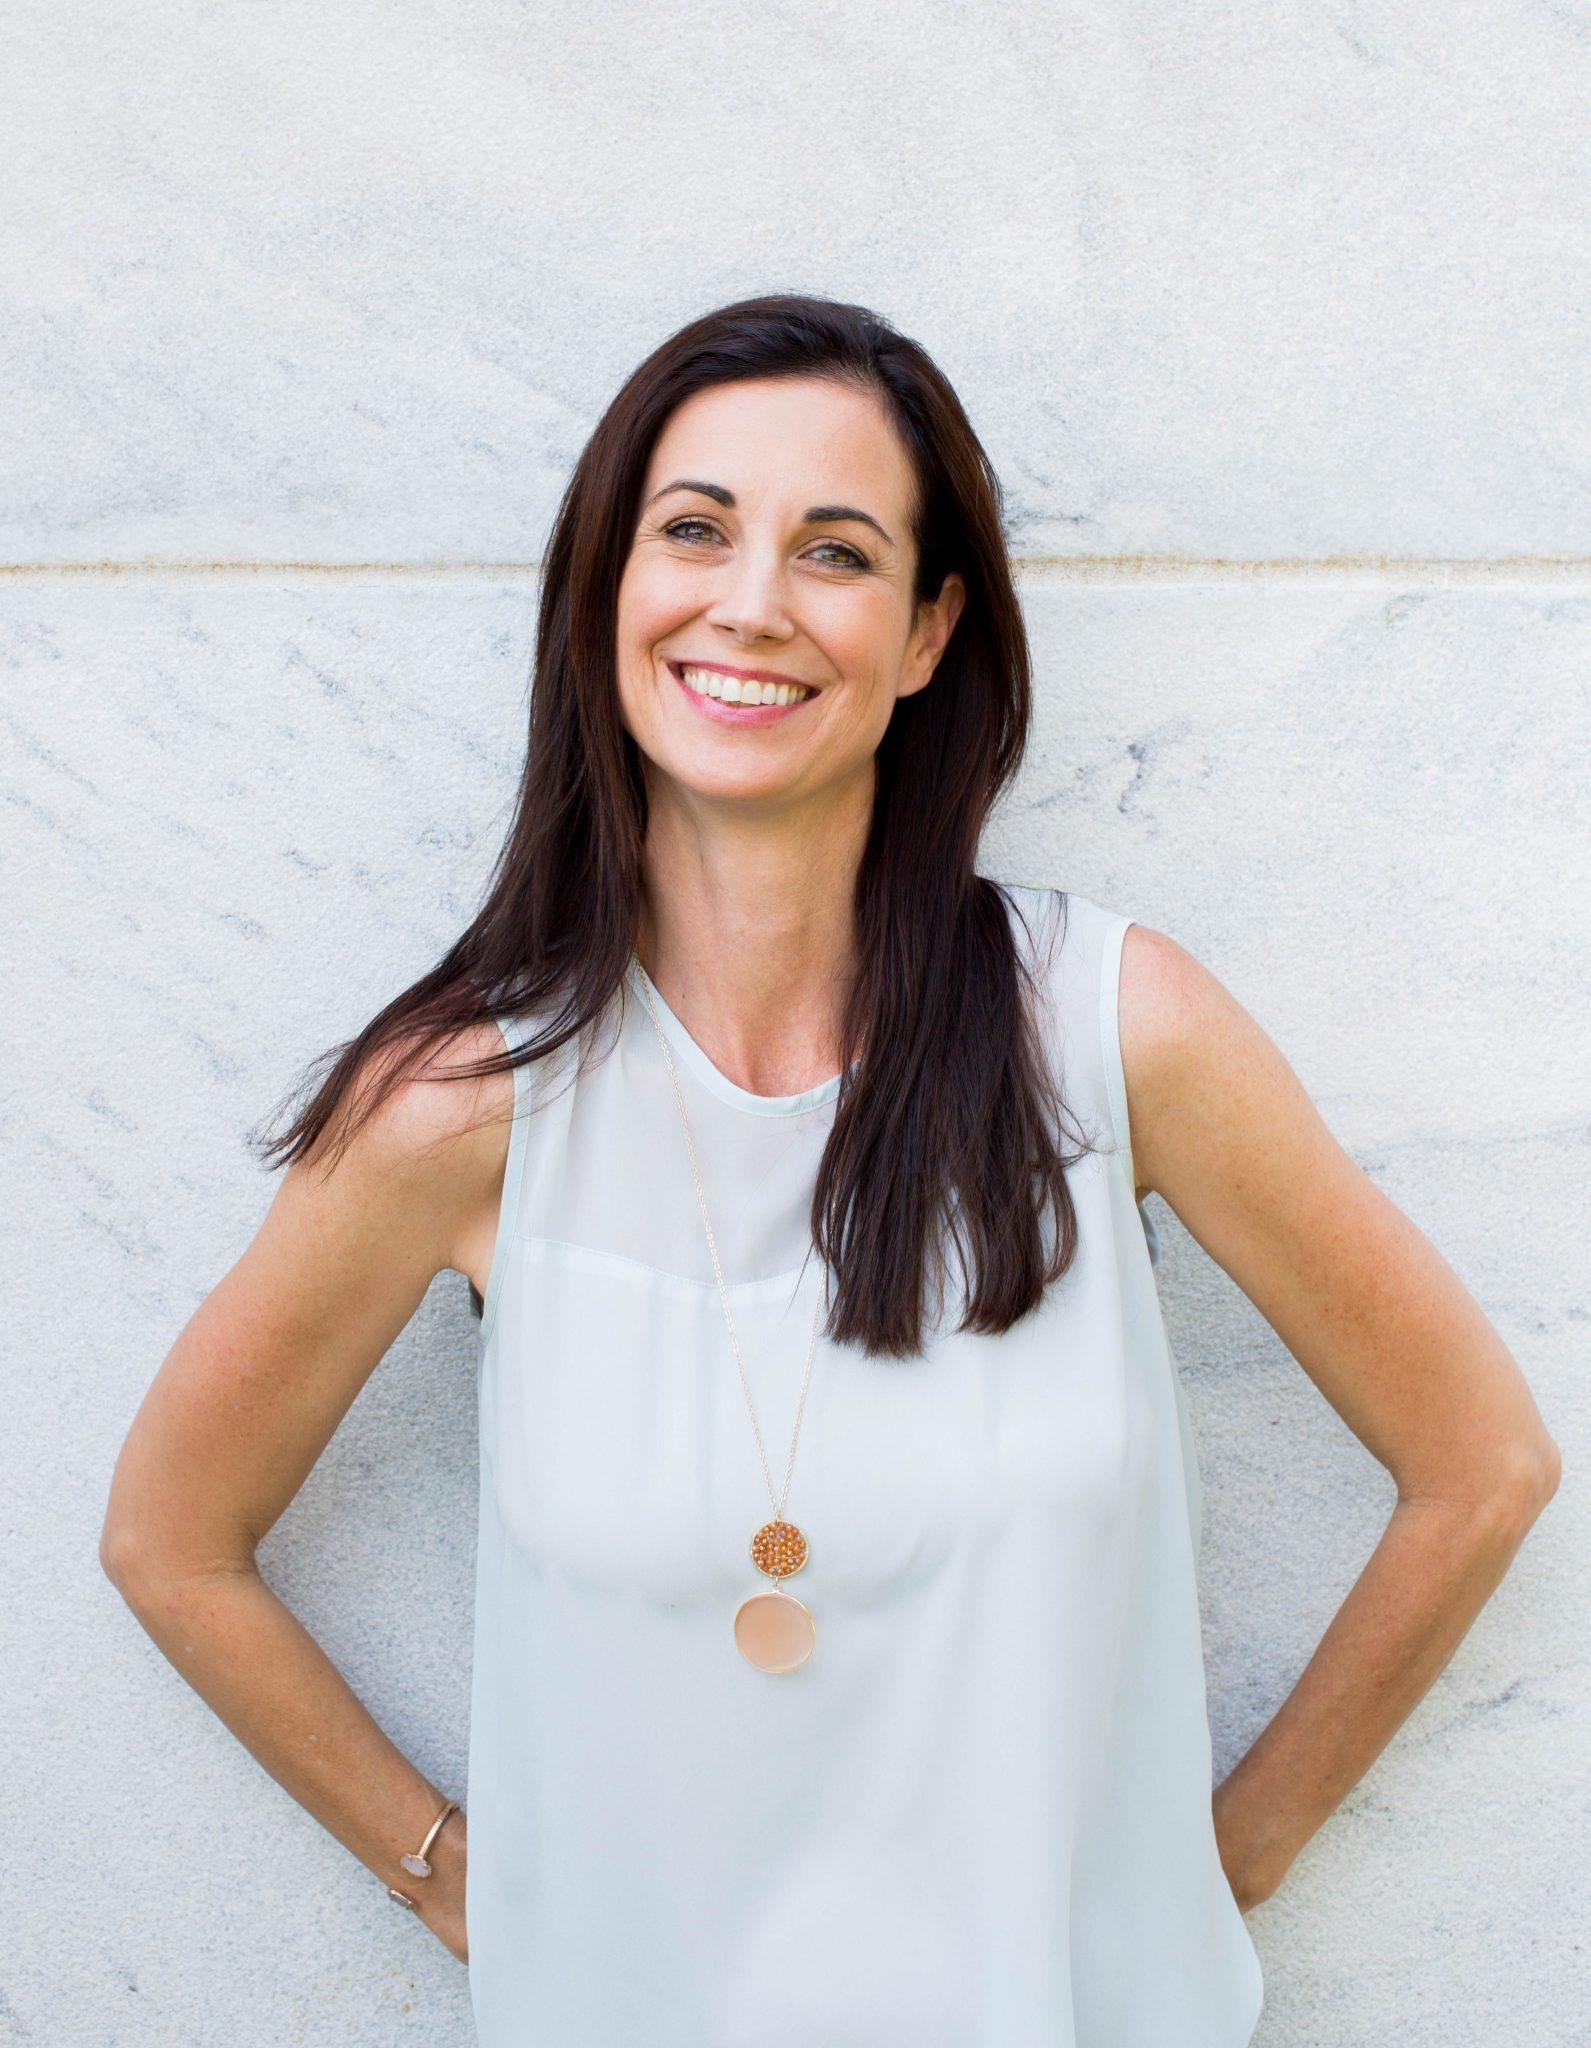 Dr. Tricia Pingel